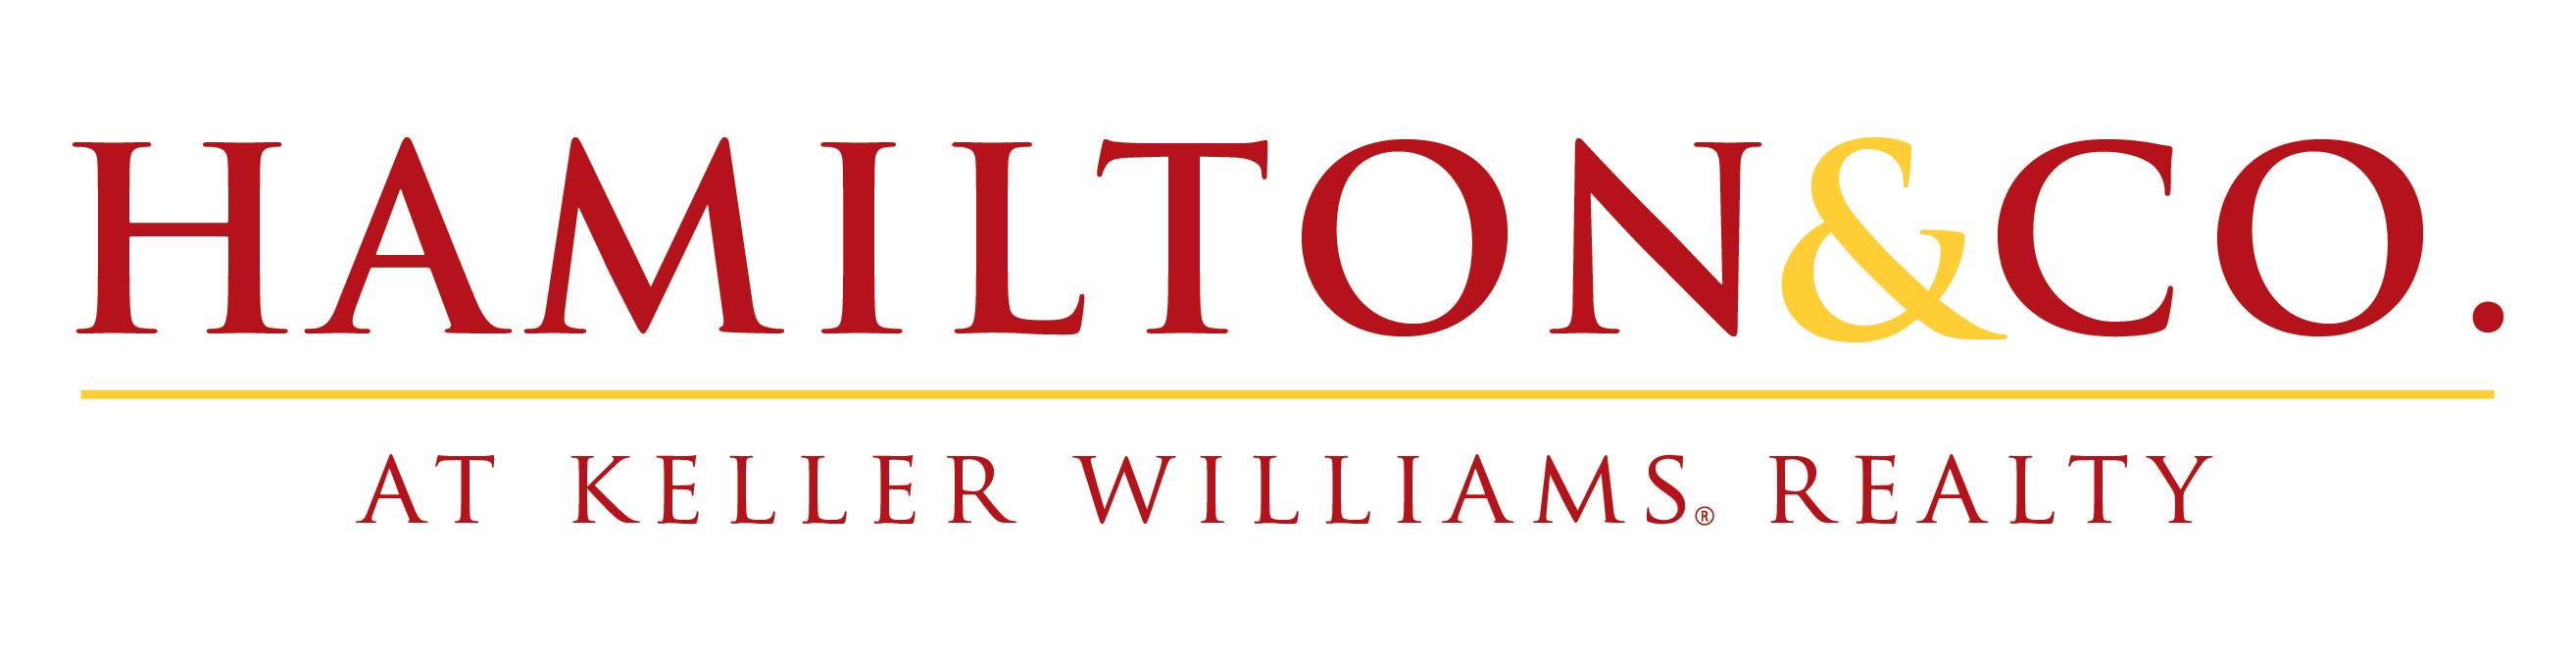 Hamilton & Co. of Keller Williams logo